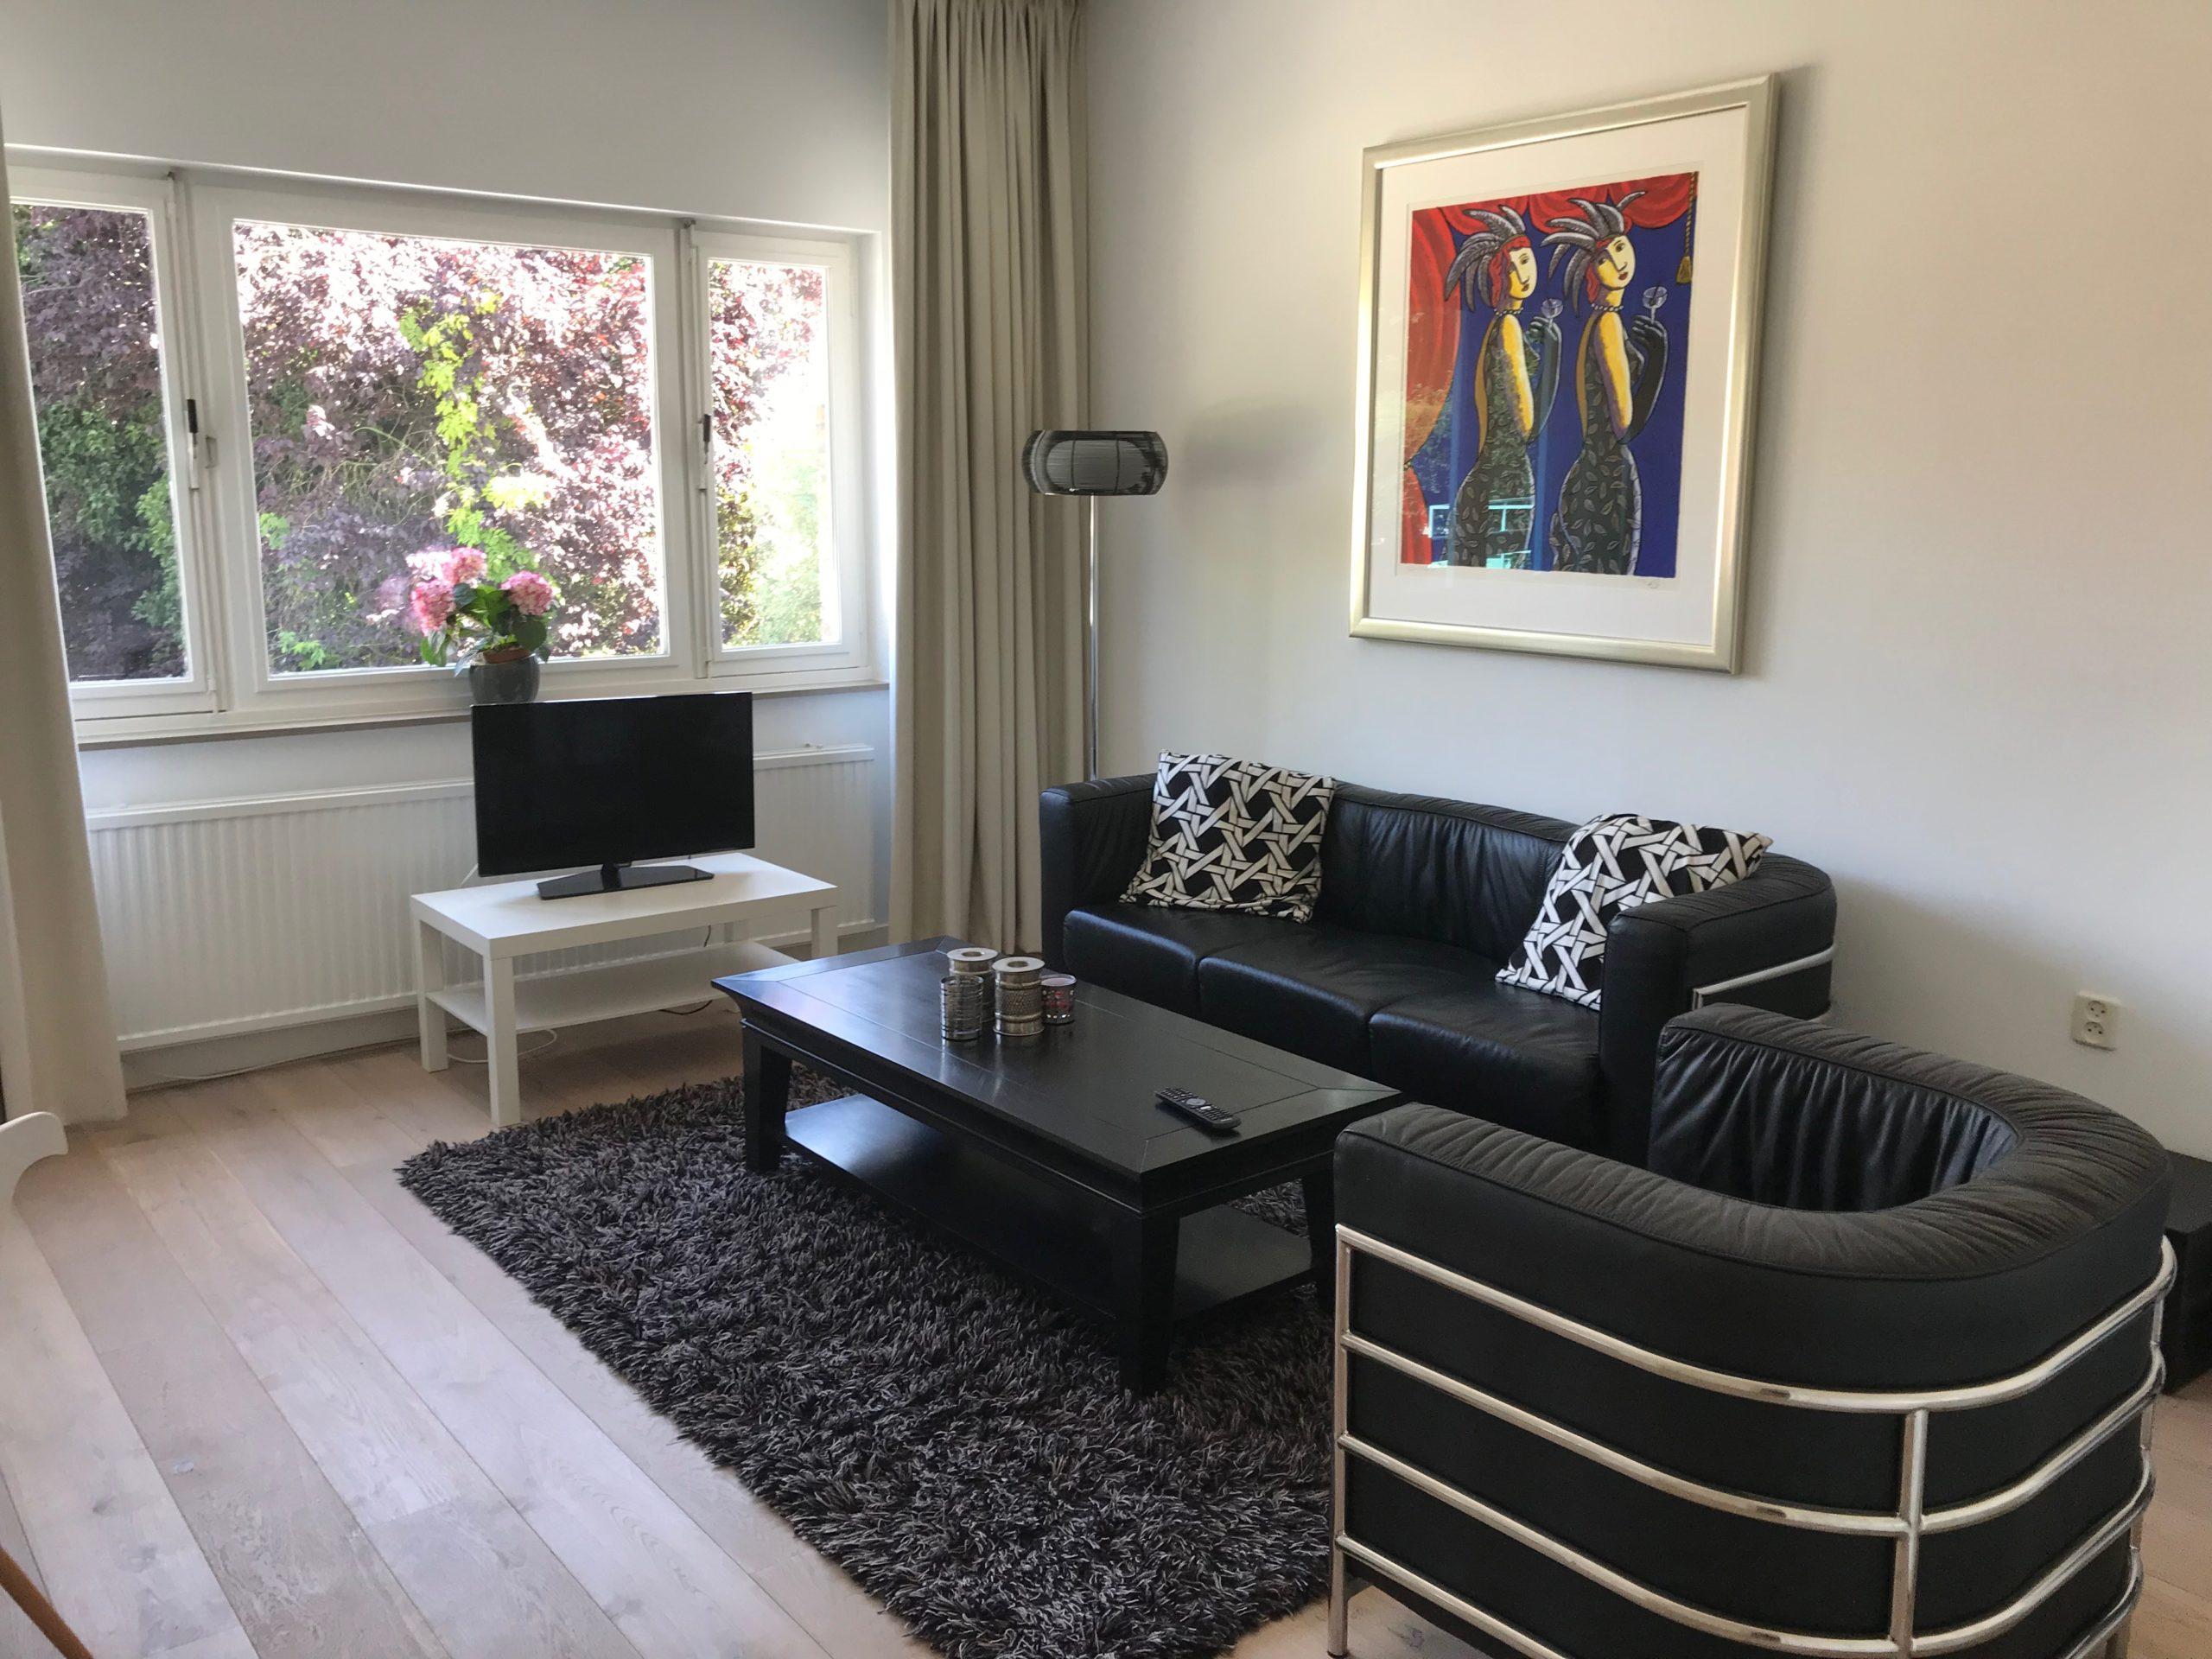 Te huur: Calvariestraat 19 a  6211 NH Maastricht. Huurprijs € 1150 per maand